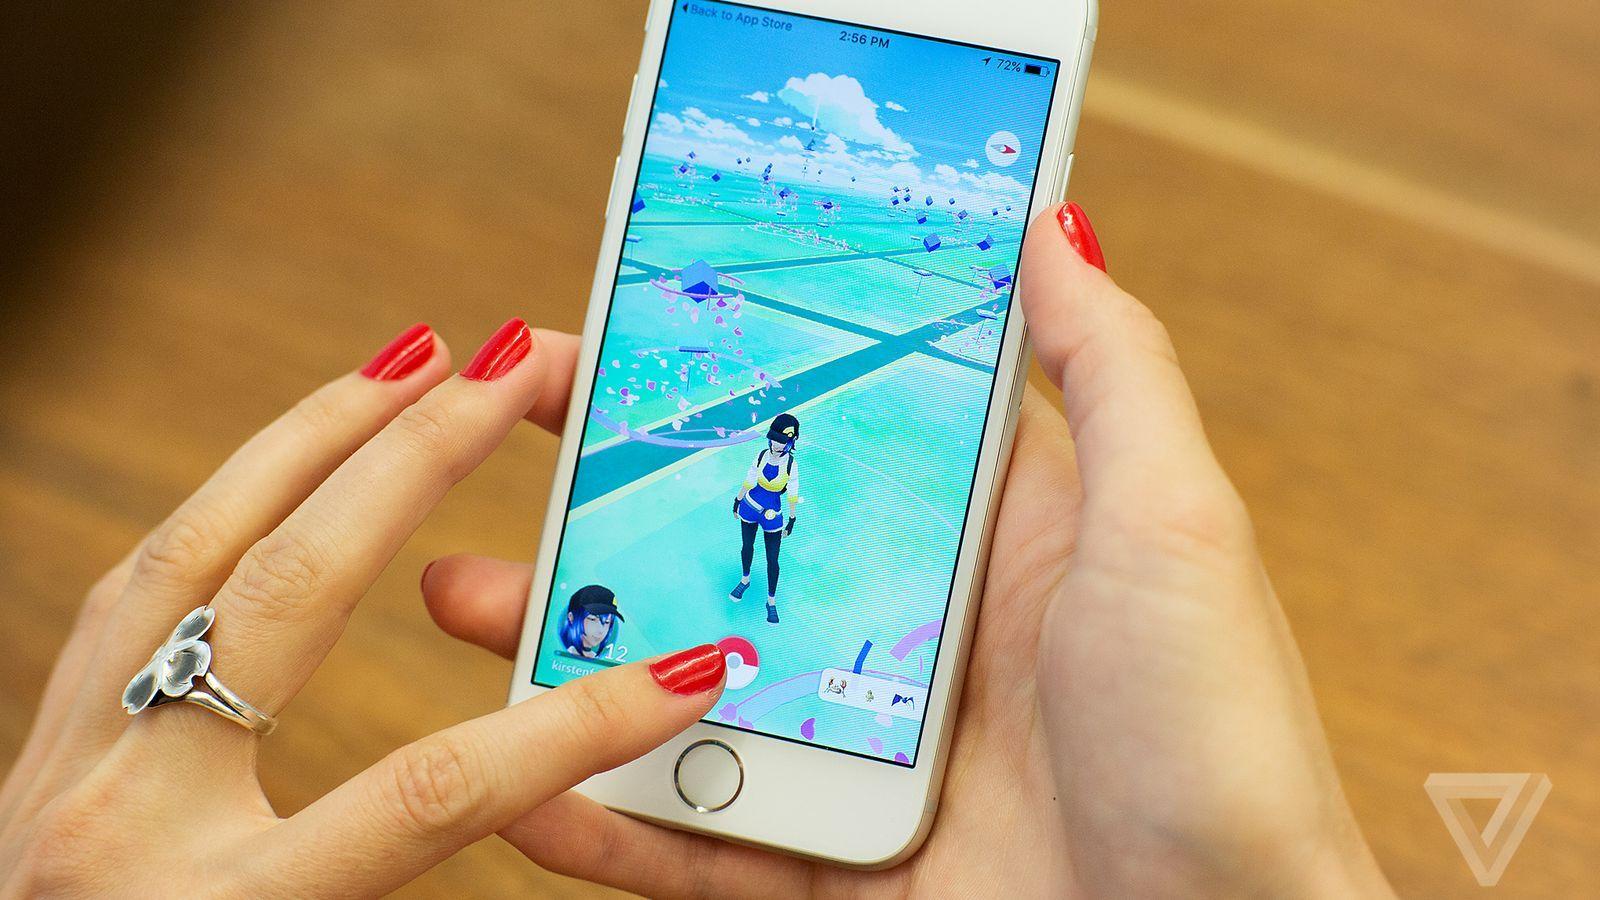 Pokémon Go uses little data but it's still a big drag on mobile networks